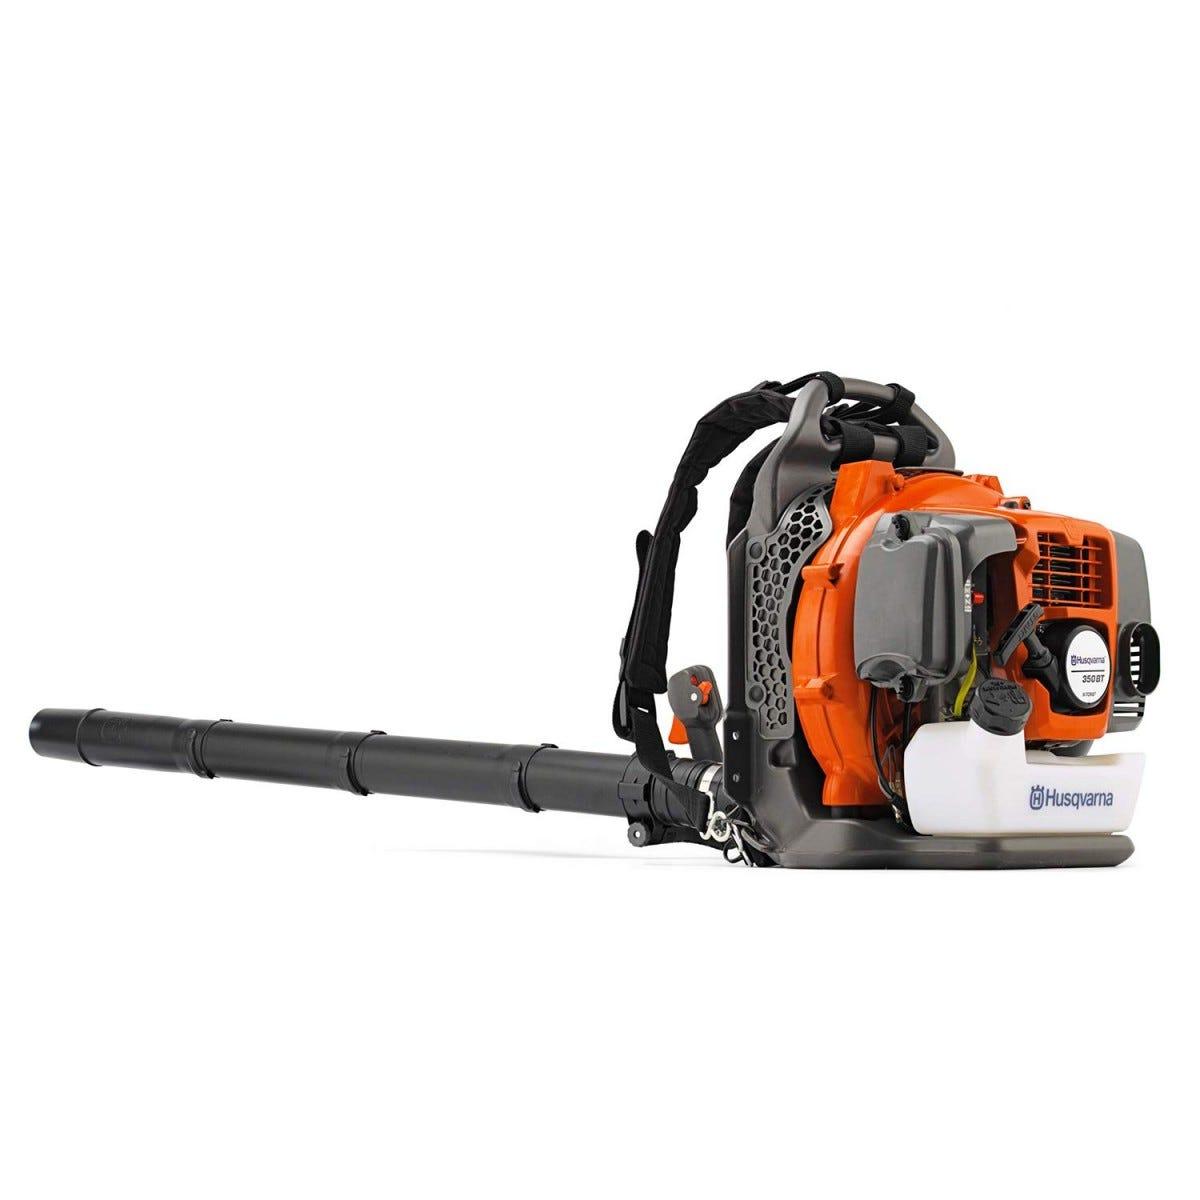 Husqvarna965877502 350BT leaf blower